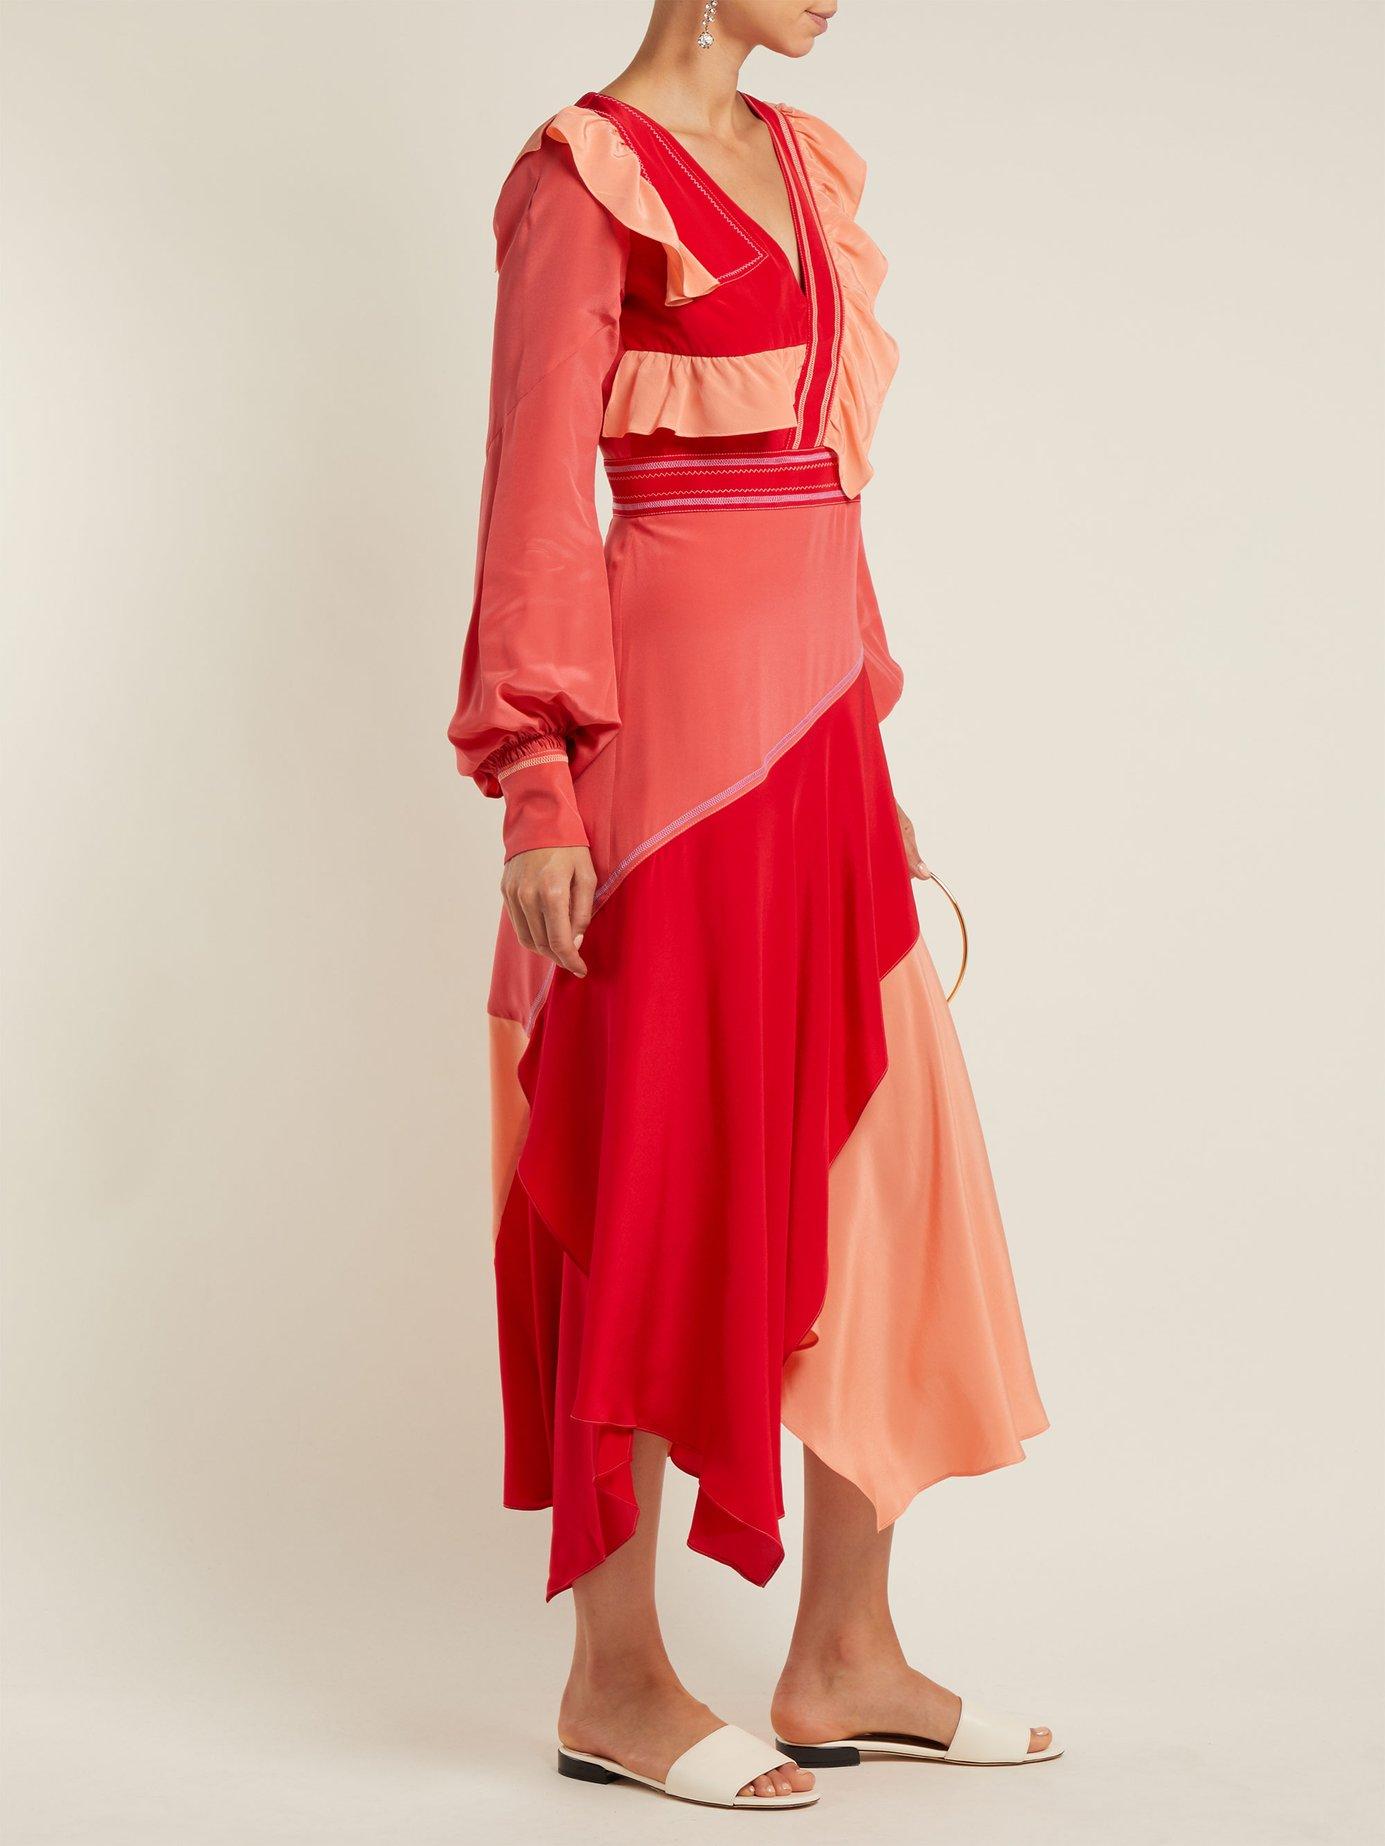 Contrast-panel ruffled silk dress by Peter Pilotto